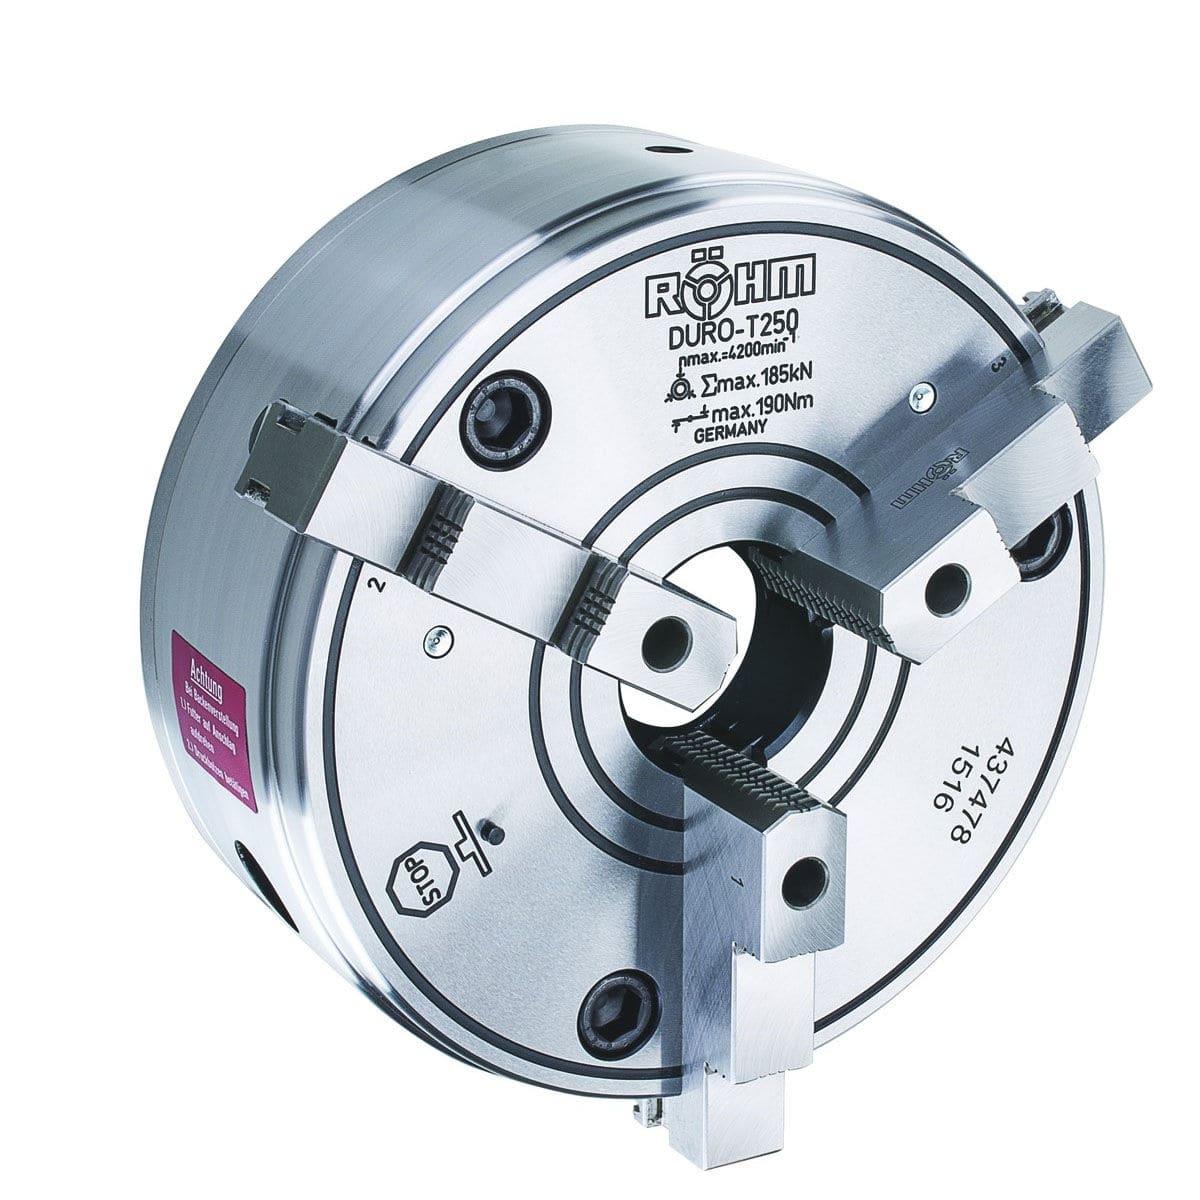 manual tightening turning chuck / 3-jaw / lathe / through-hole - DURO-T  series